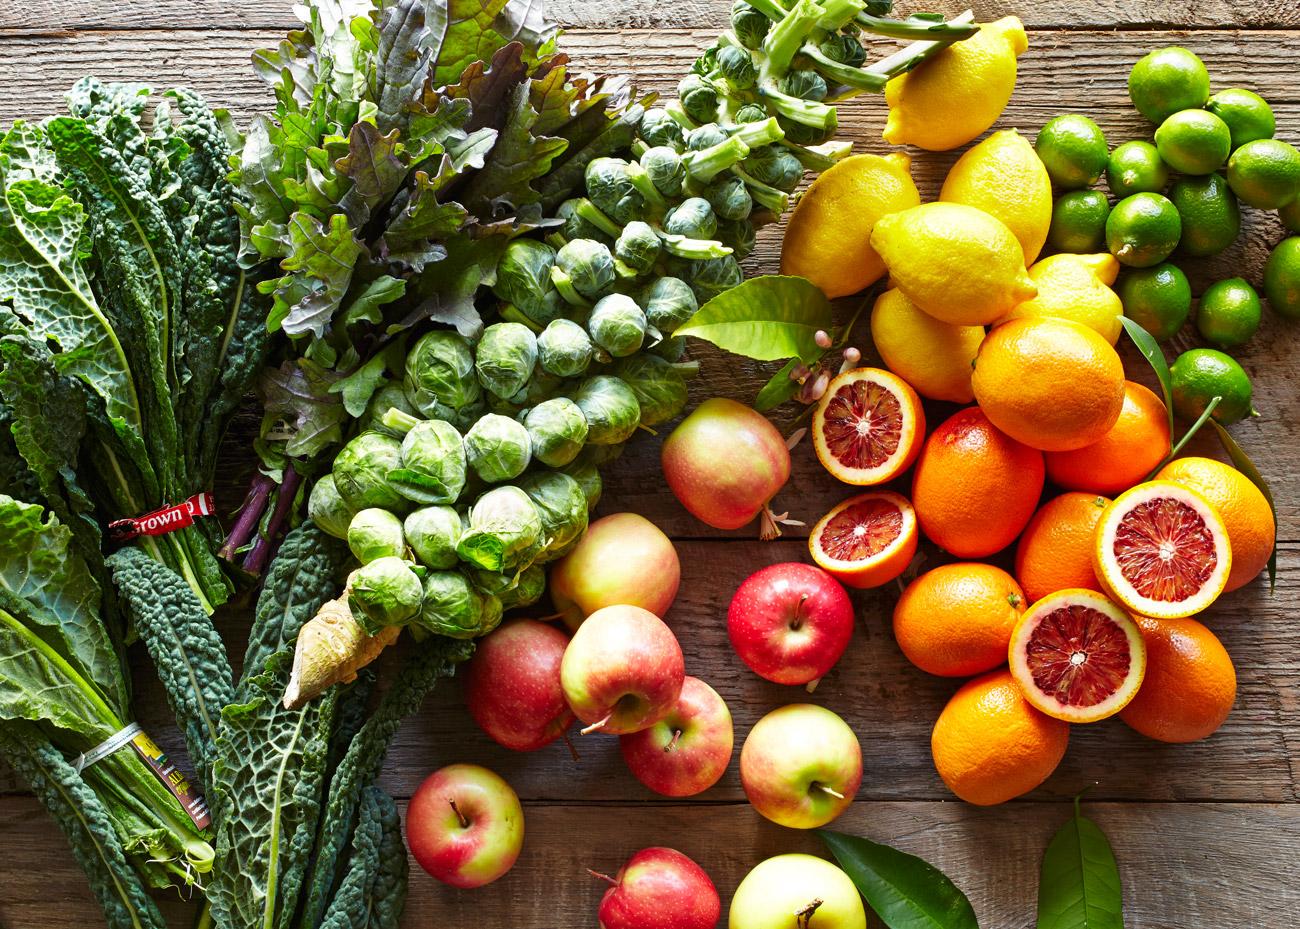 abreakey-foodphotography-fruitvegetablestilllife.jpg